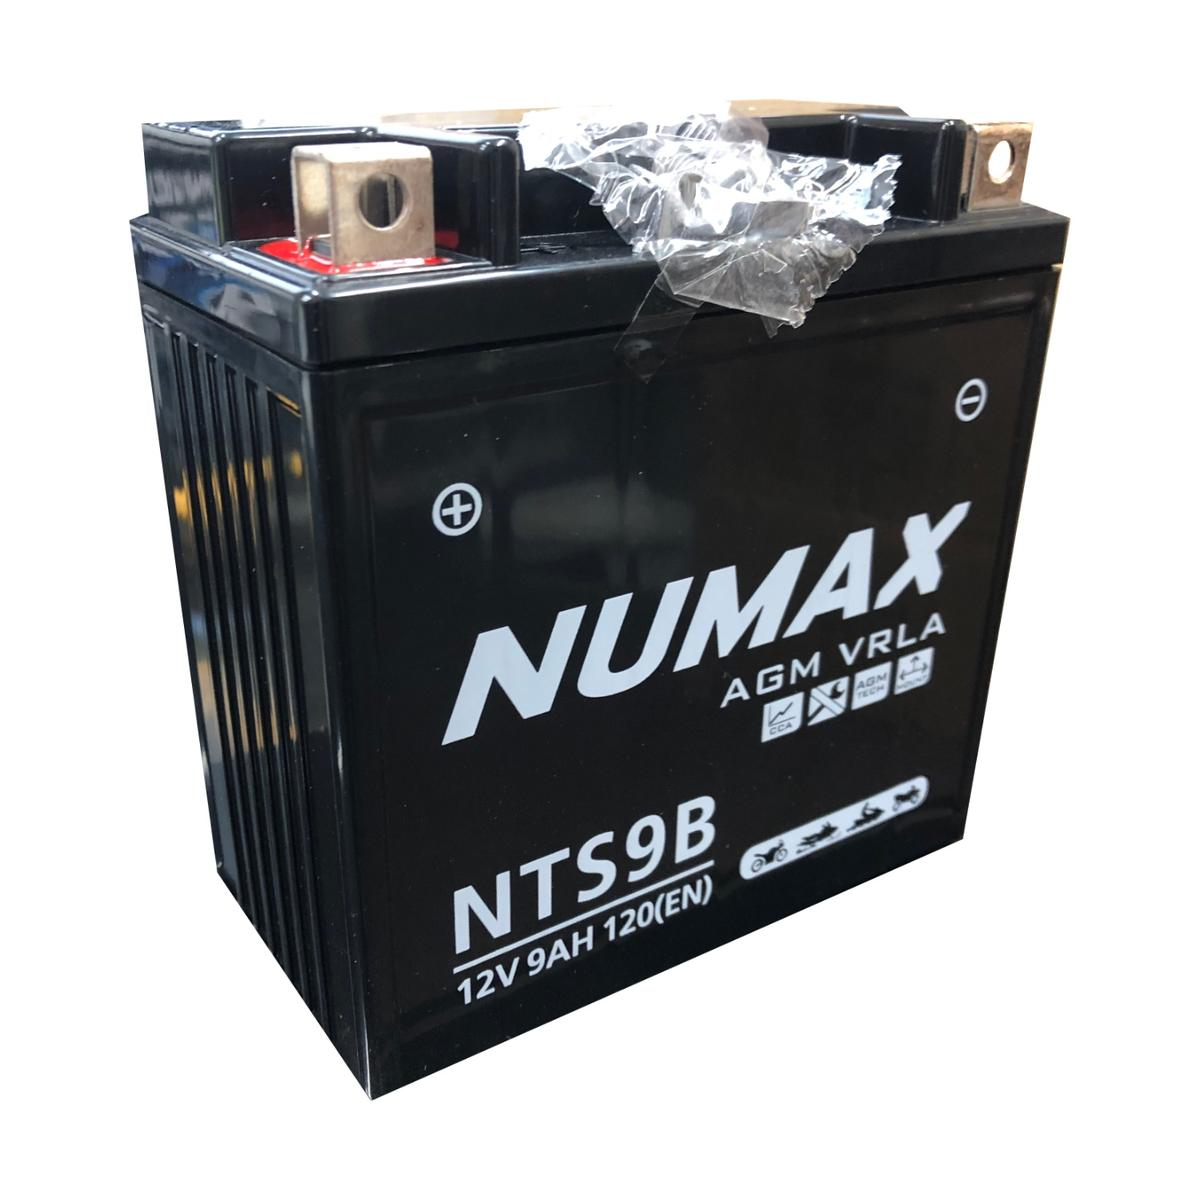 Numax NTS9B 12v Bike Motorbike Motorcycle Battery VESPA 125cc Vespa PX E YB9L-B